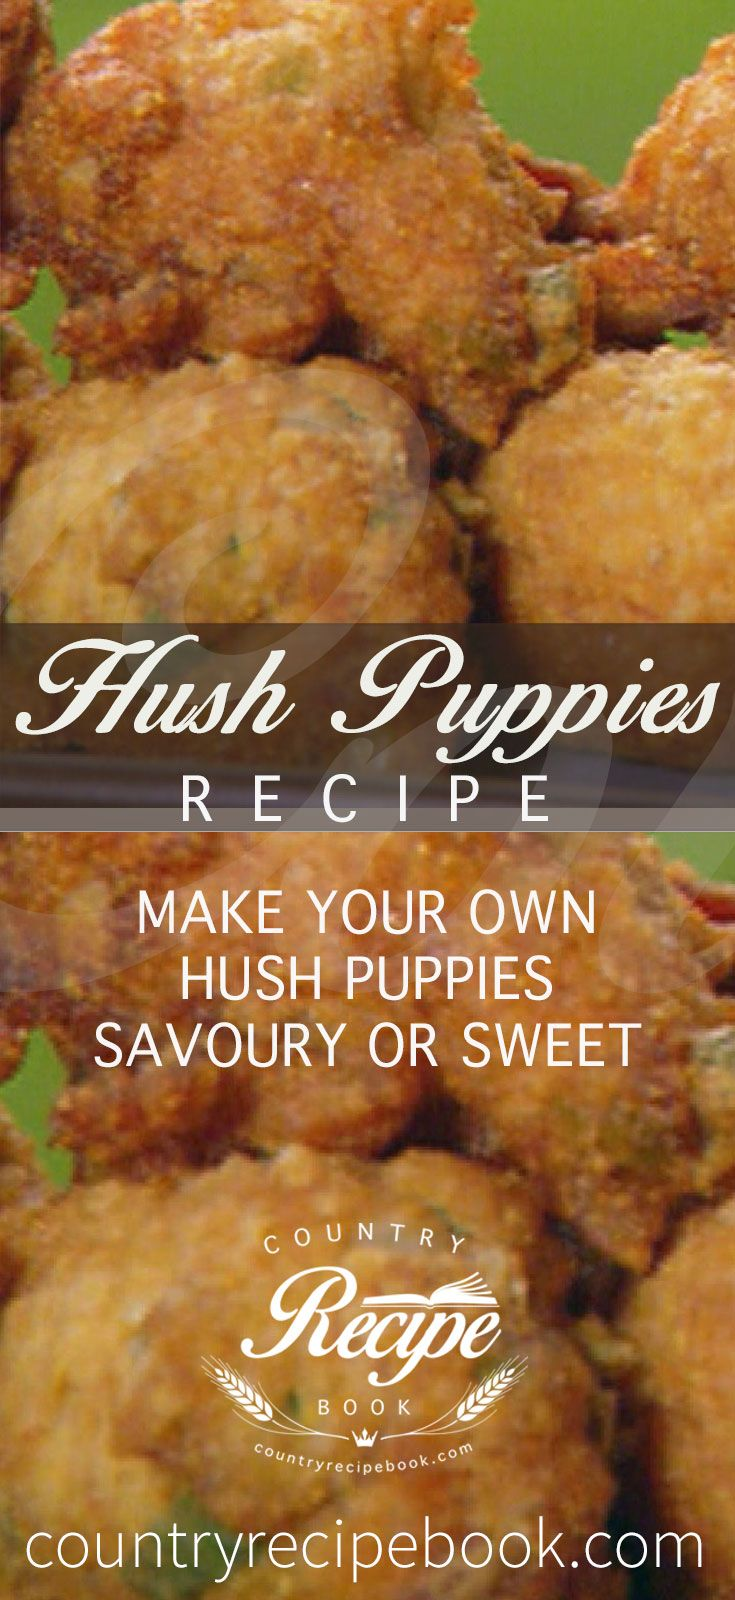 Hush Puppies Recipe Hush puppies recipe, Food recipes